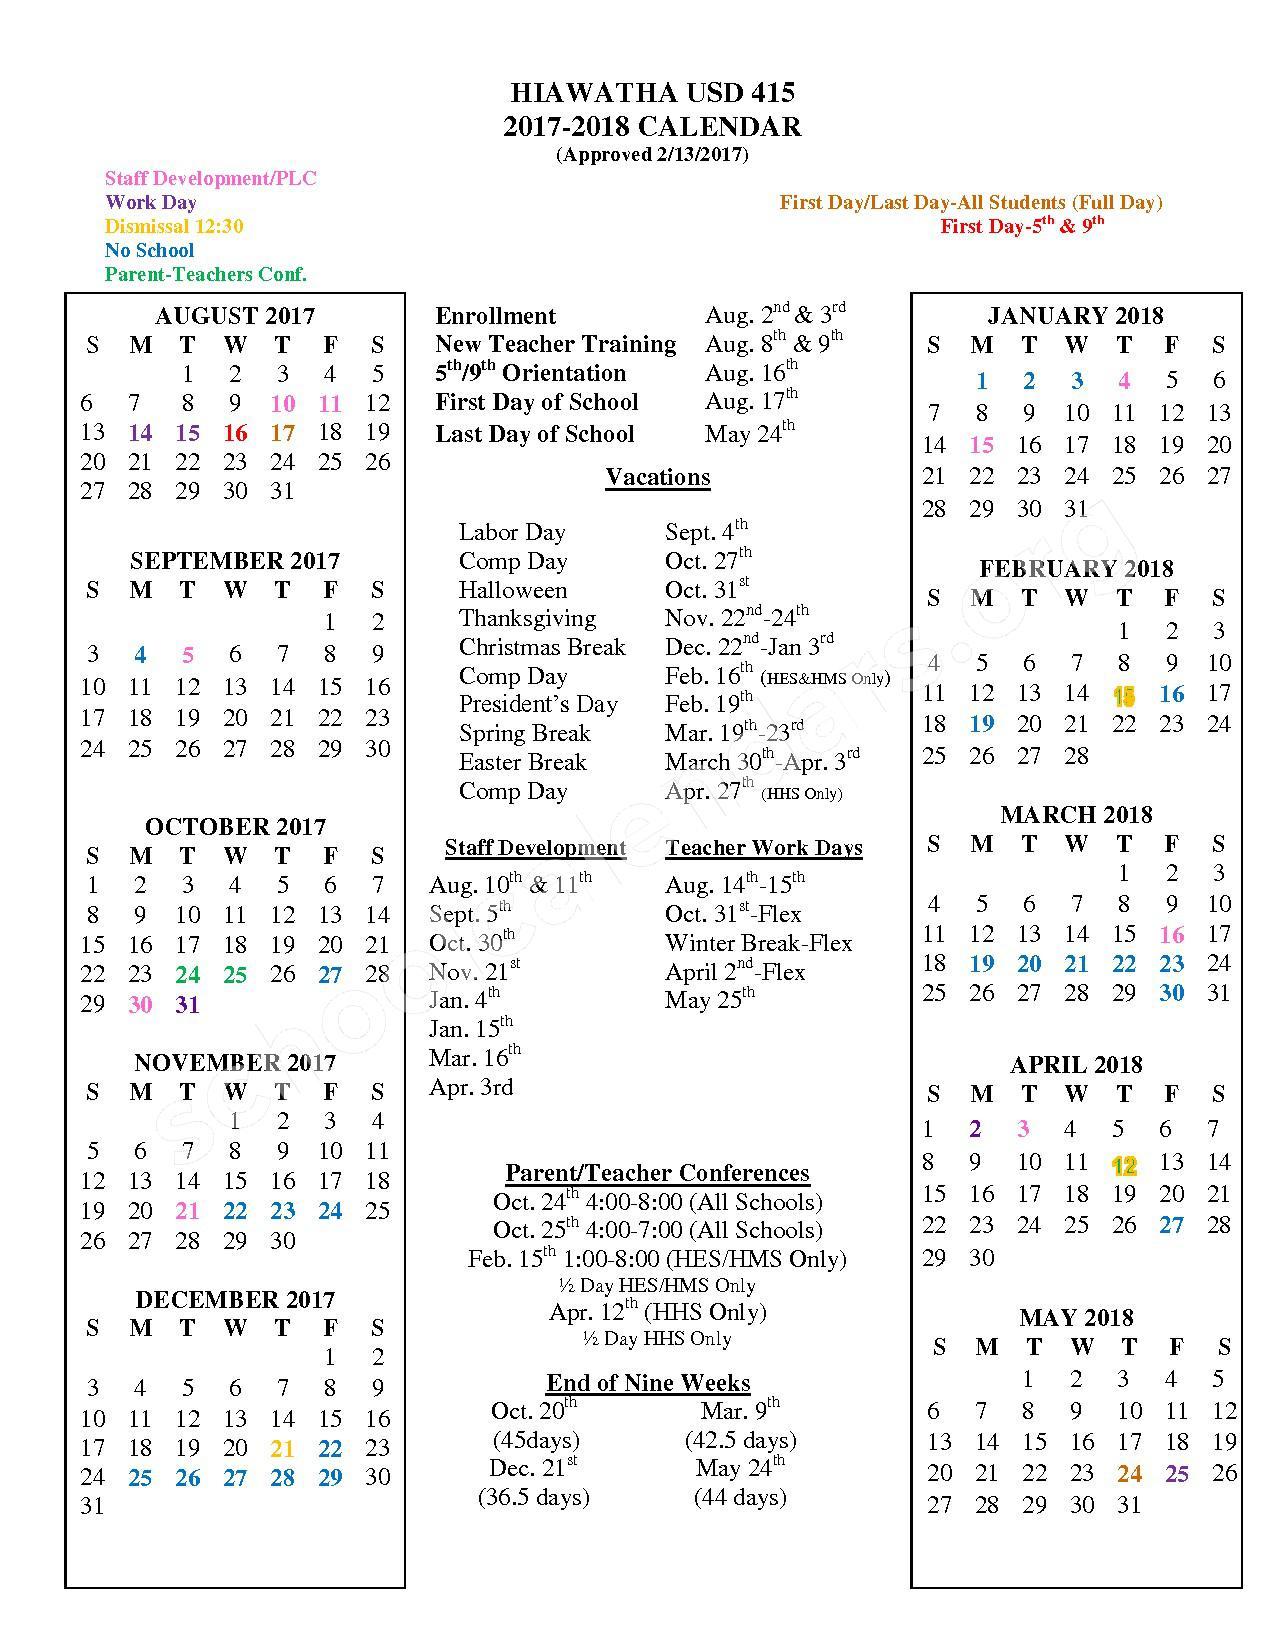 2017 - 2018 School Calendar – Hiawatha Unified School District 415 – page 1